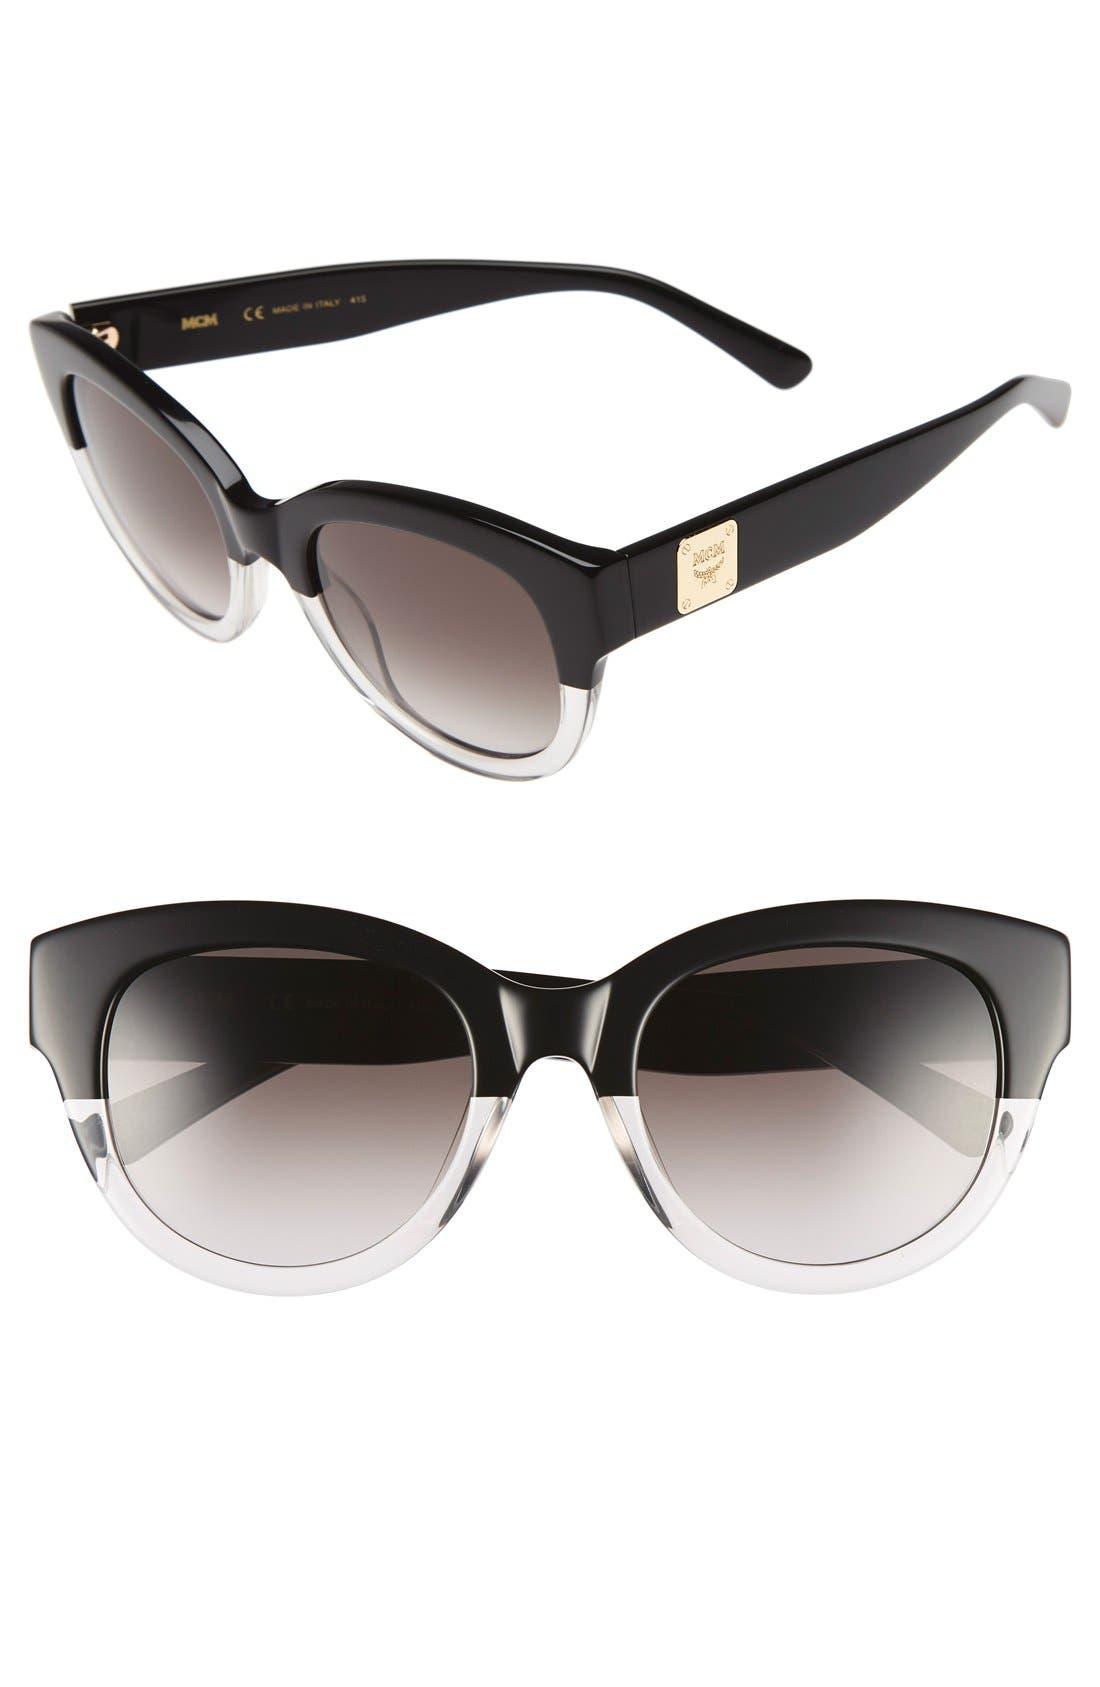 53mm Cat Eye Sunglasses,                         Main,                         color, 001